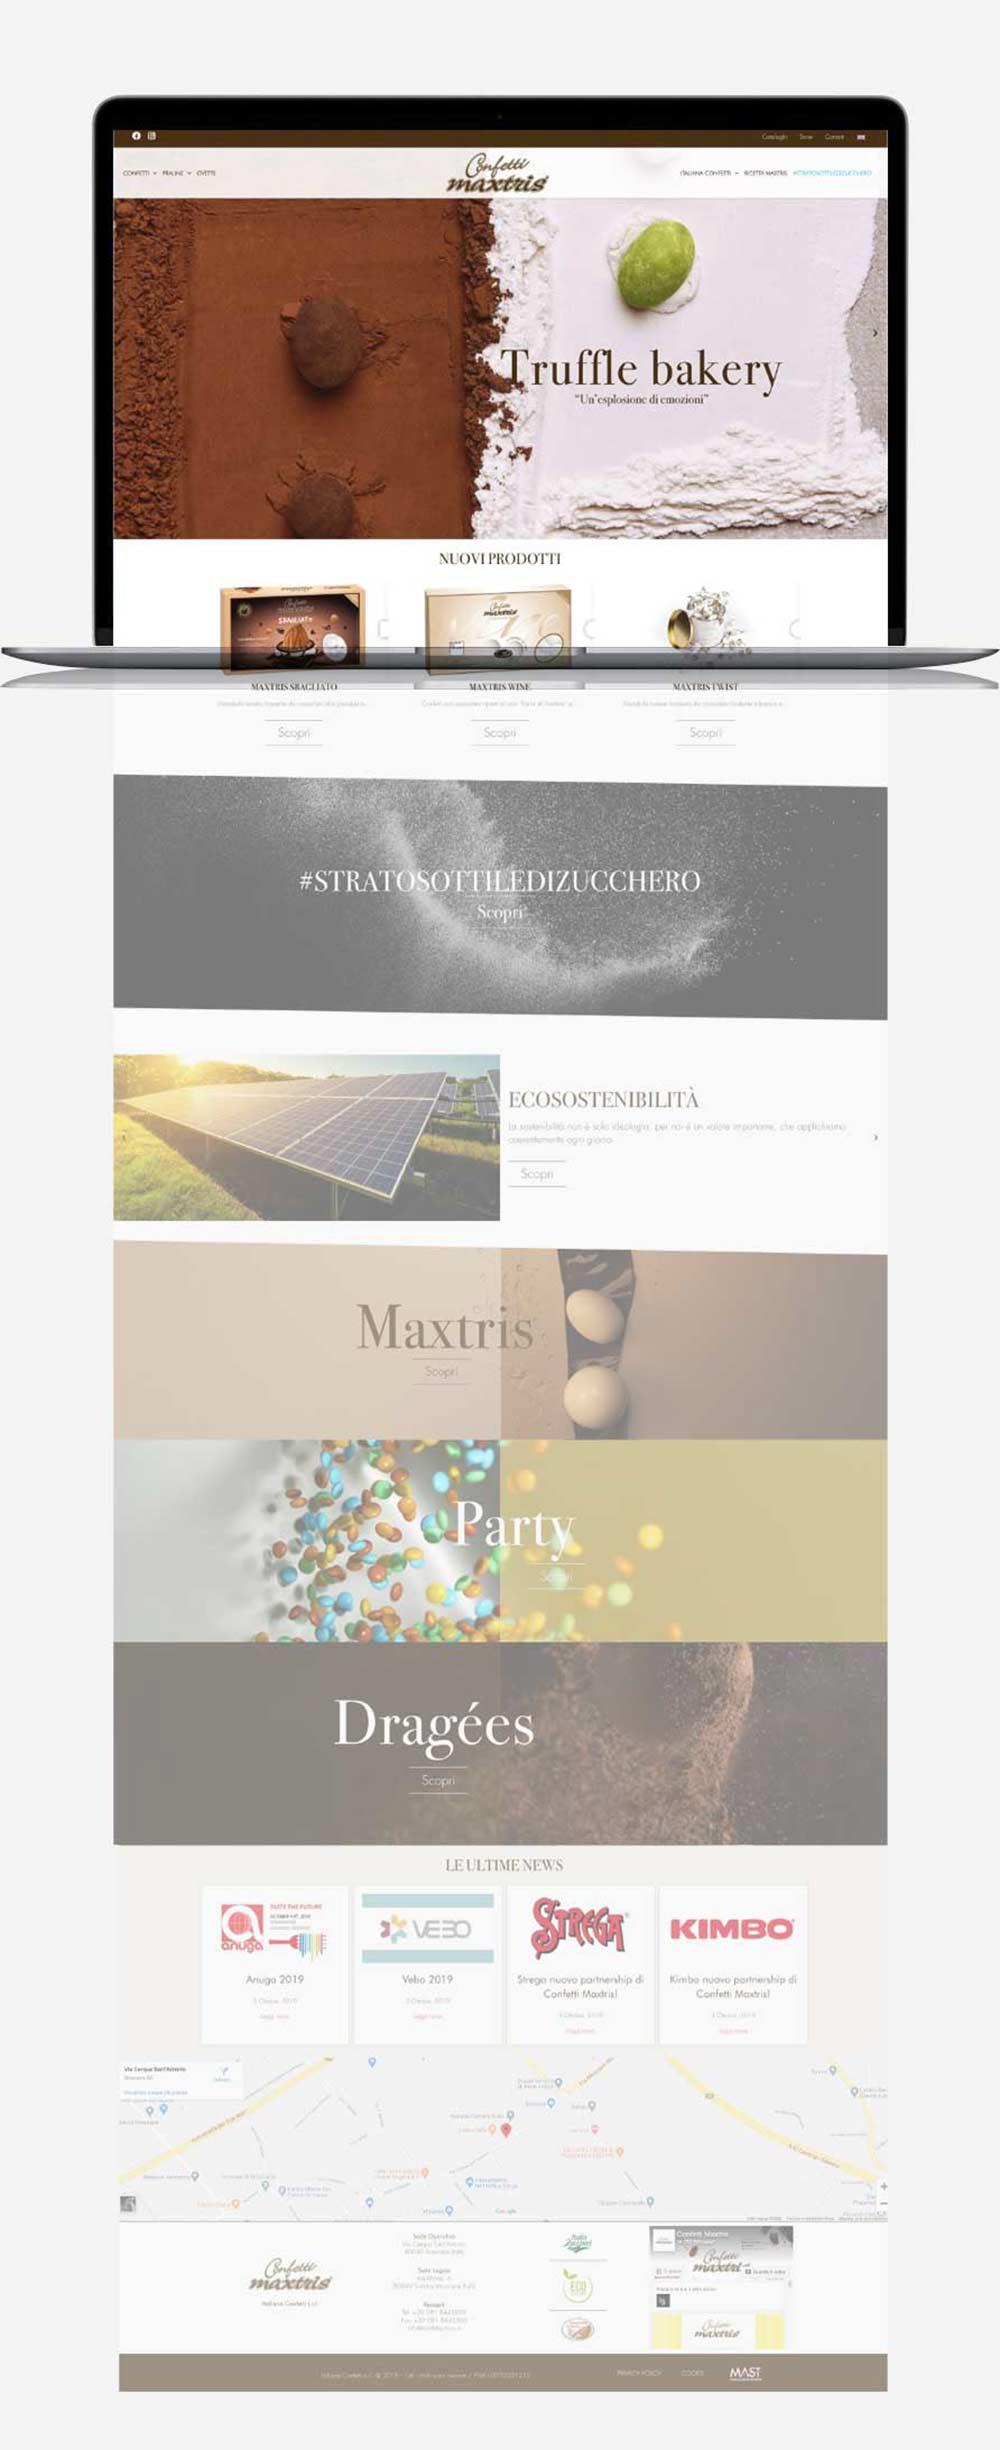 http://www.mastcommunication.com/wp-content/uploads/2020/03/MAST_NEWPRESENTAZIONE-Maxtris250220-10.jpg